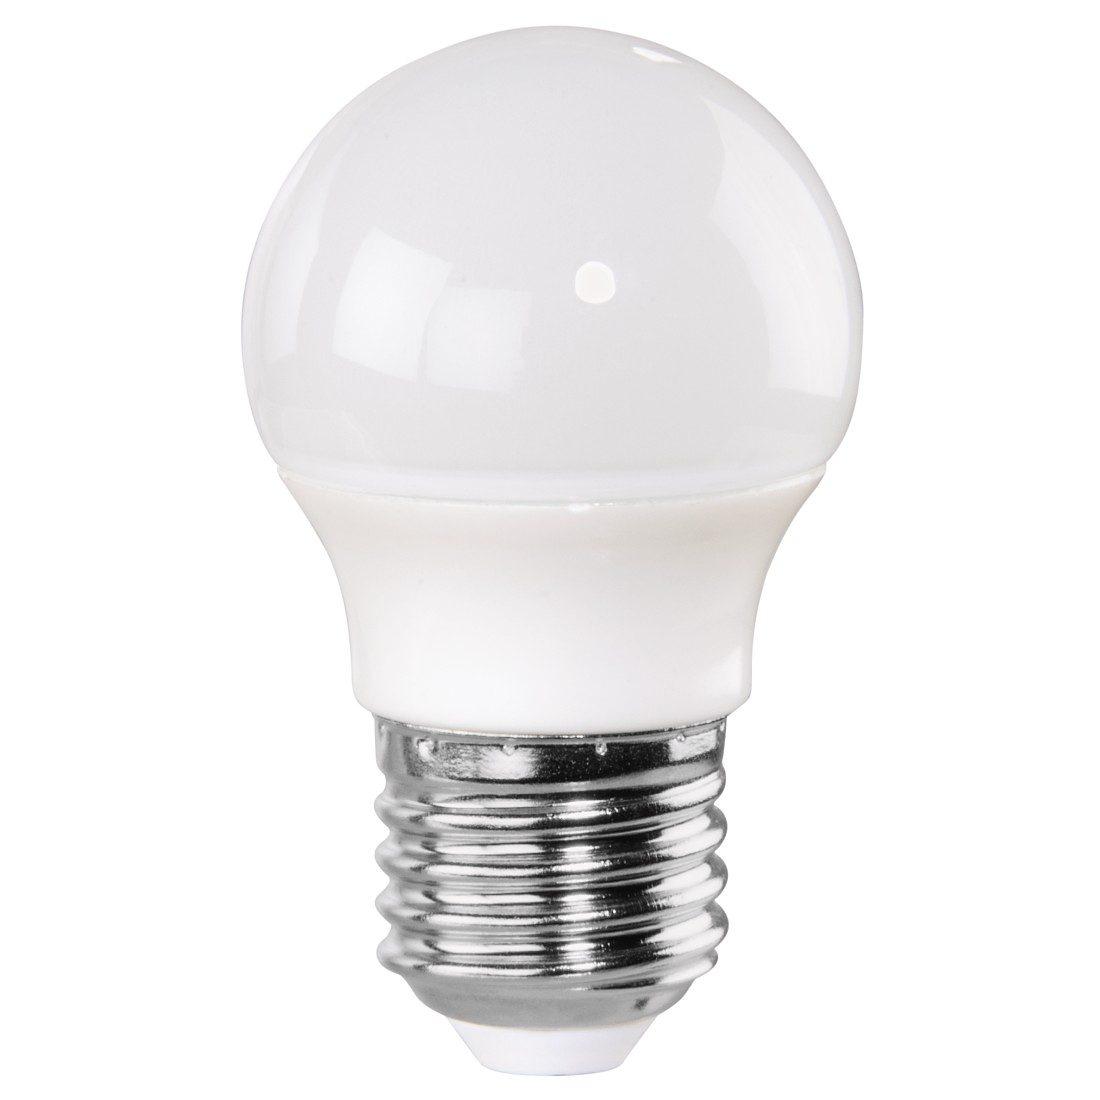 Xavax LED-Lampe, 5W, Tropfenform, E27, Warmweiß